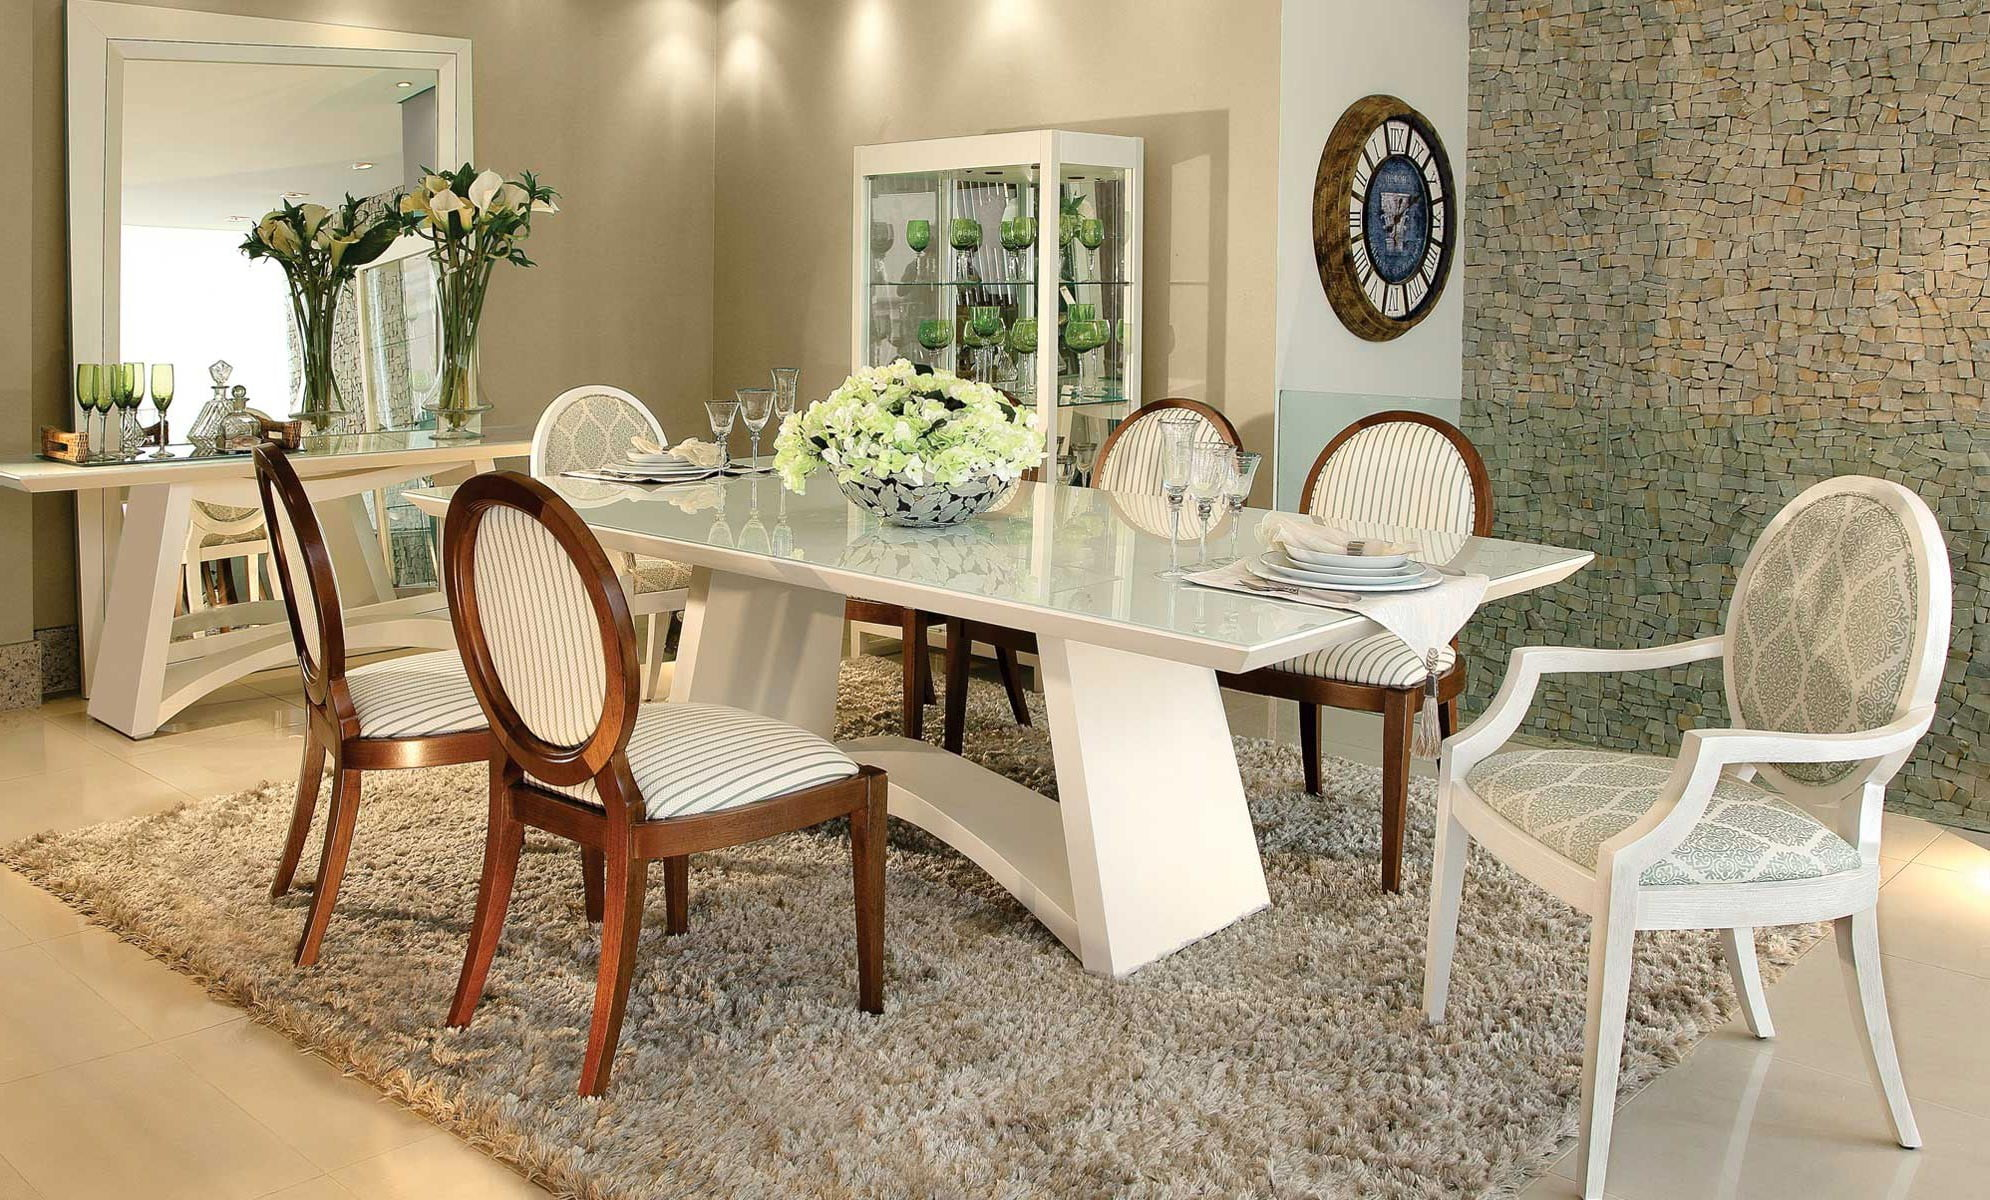 Cadeiras Para Sala De Jantar Divina Haus -> Cadeiras Para Sala De Jantar Acrilico